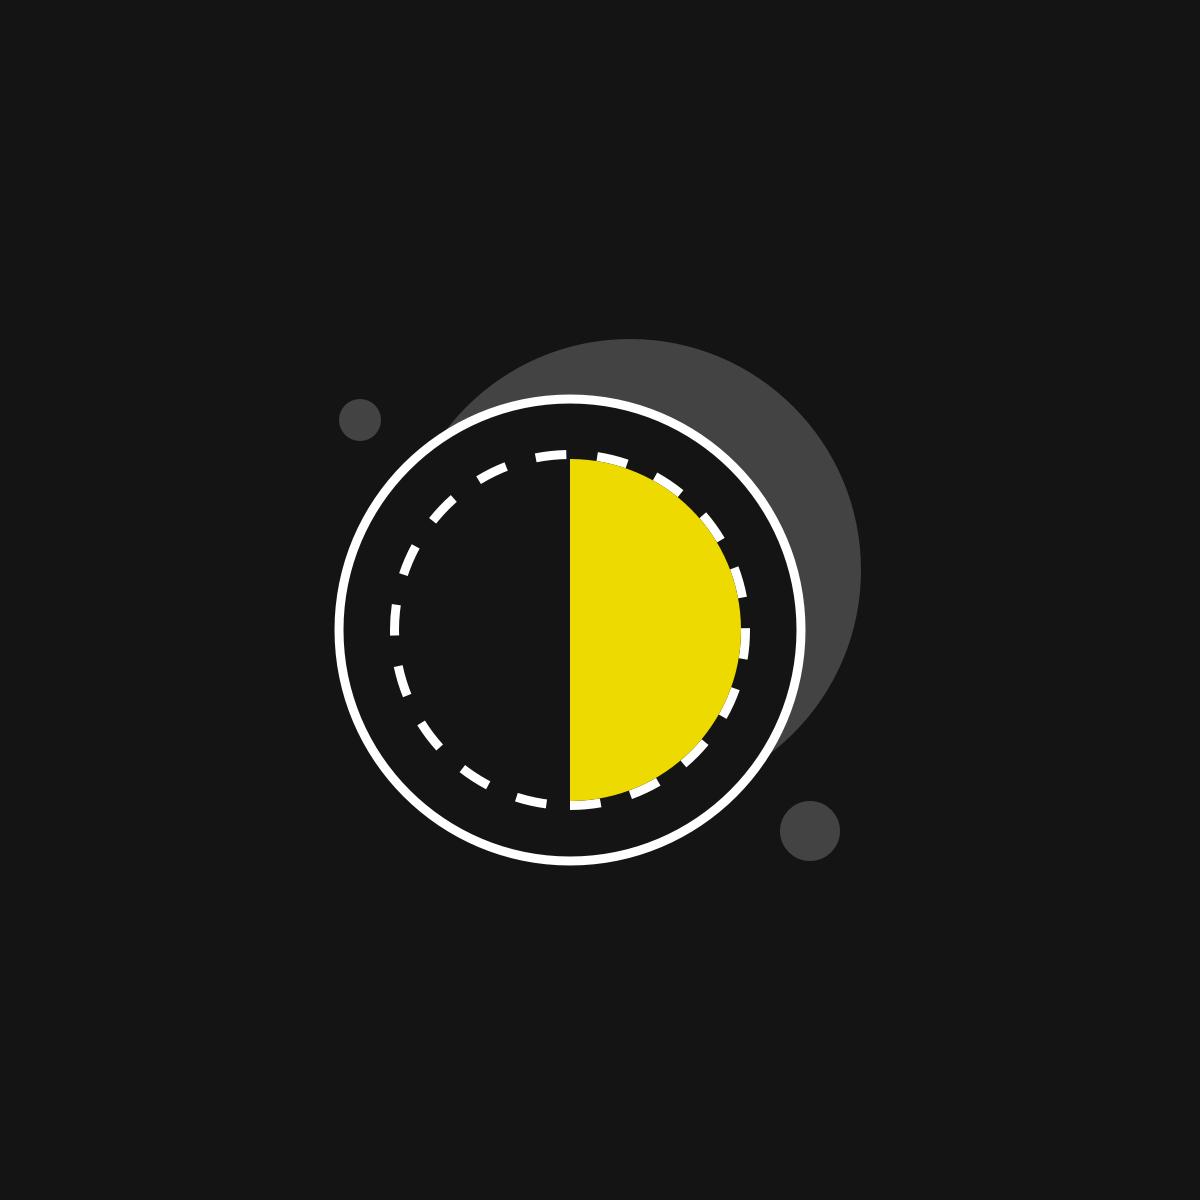 GRAY-lz-icon-transparence-black-yellow-square@3x